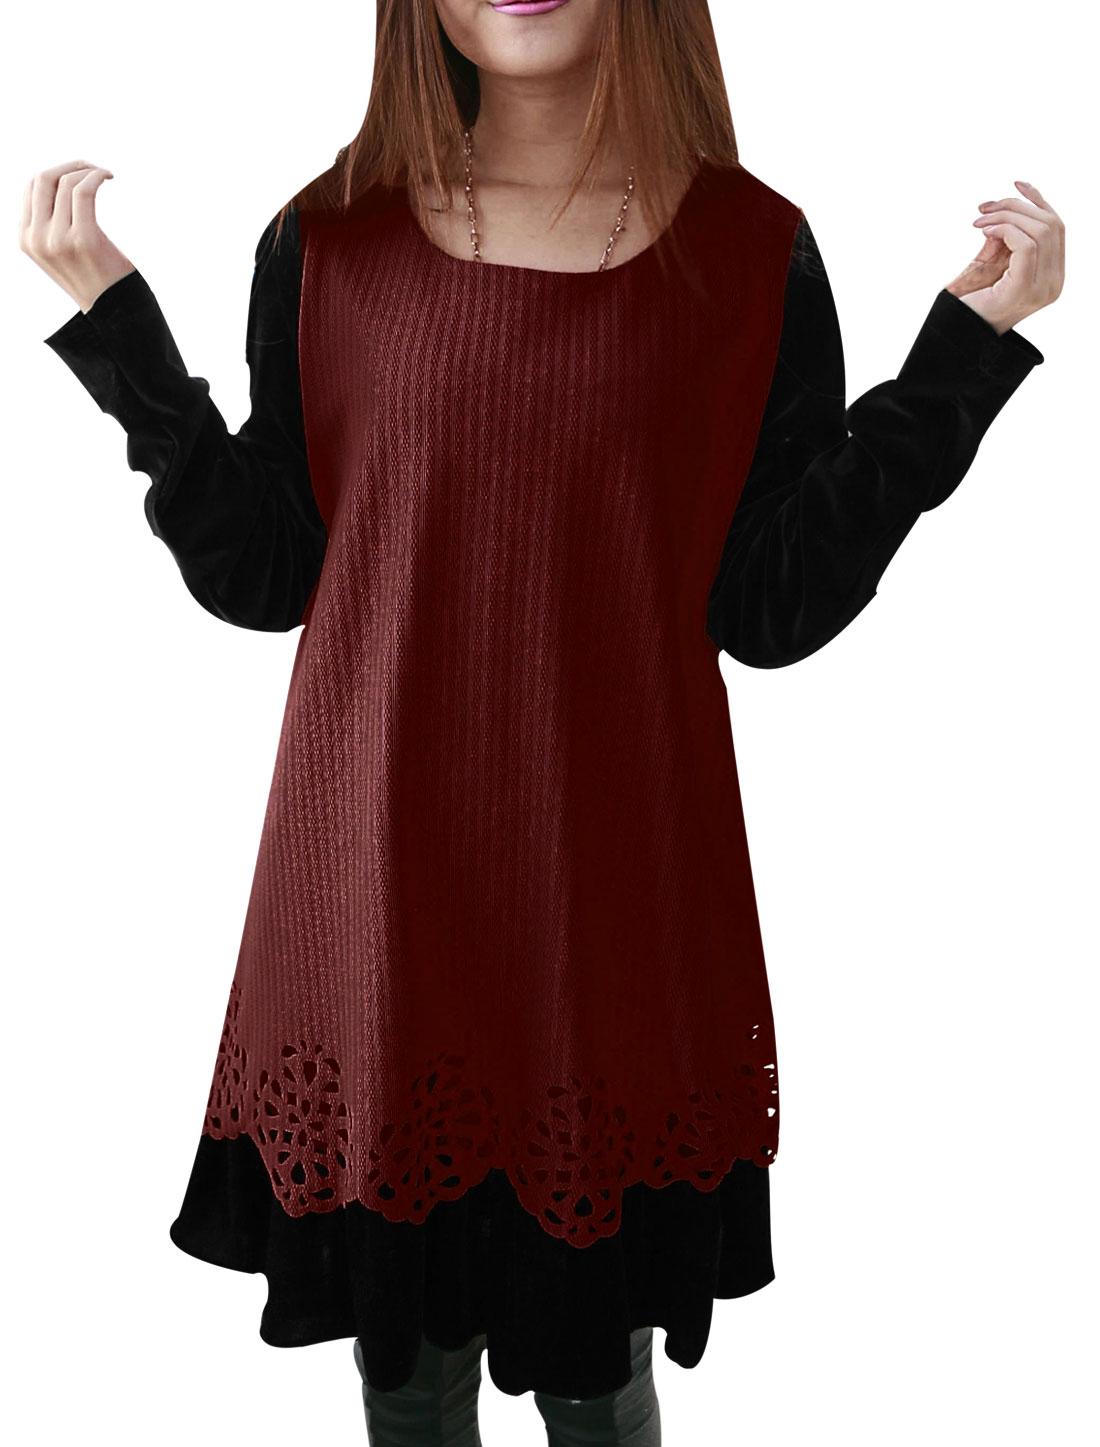 Pregnant Women Burgundy Panel Design Textured Lining Dress XL